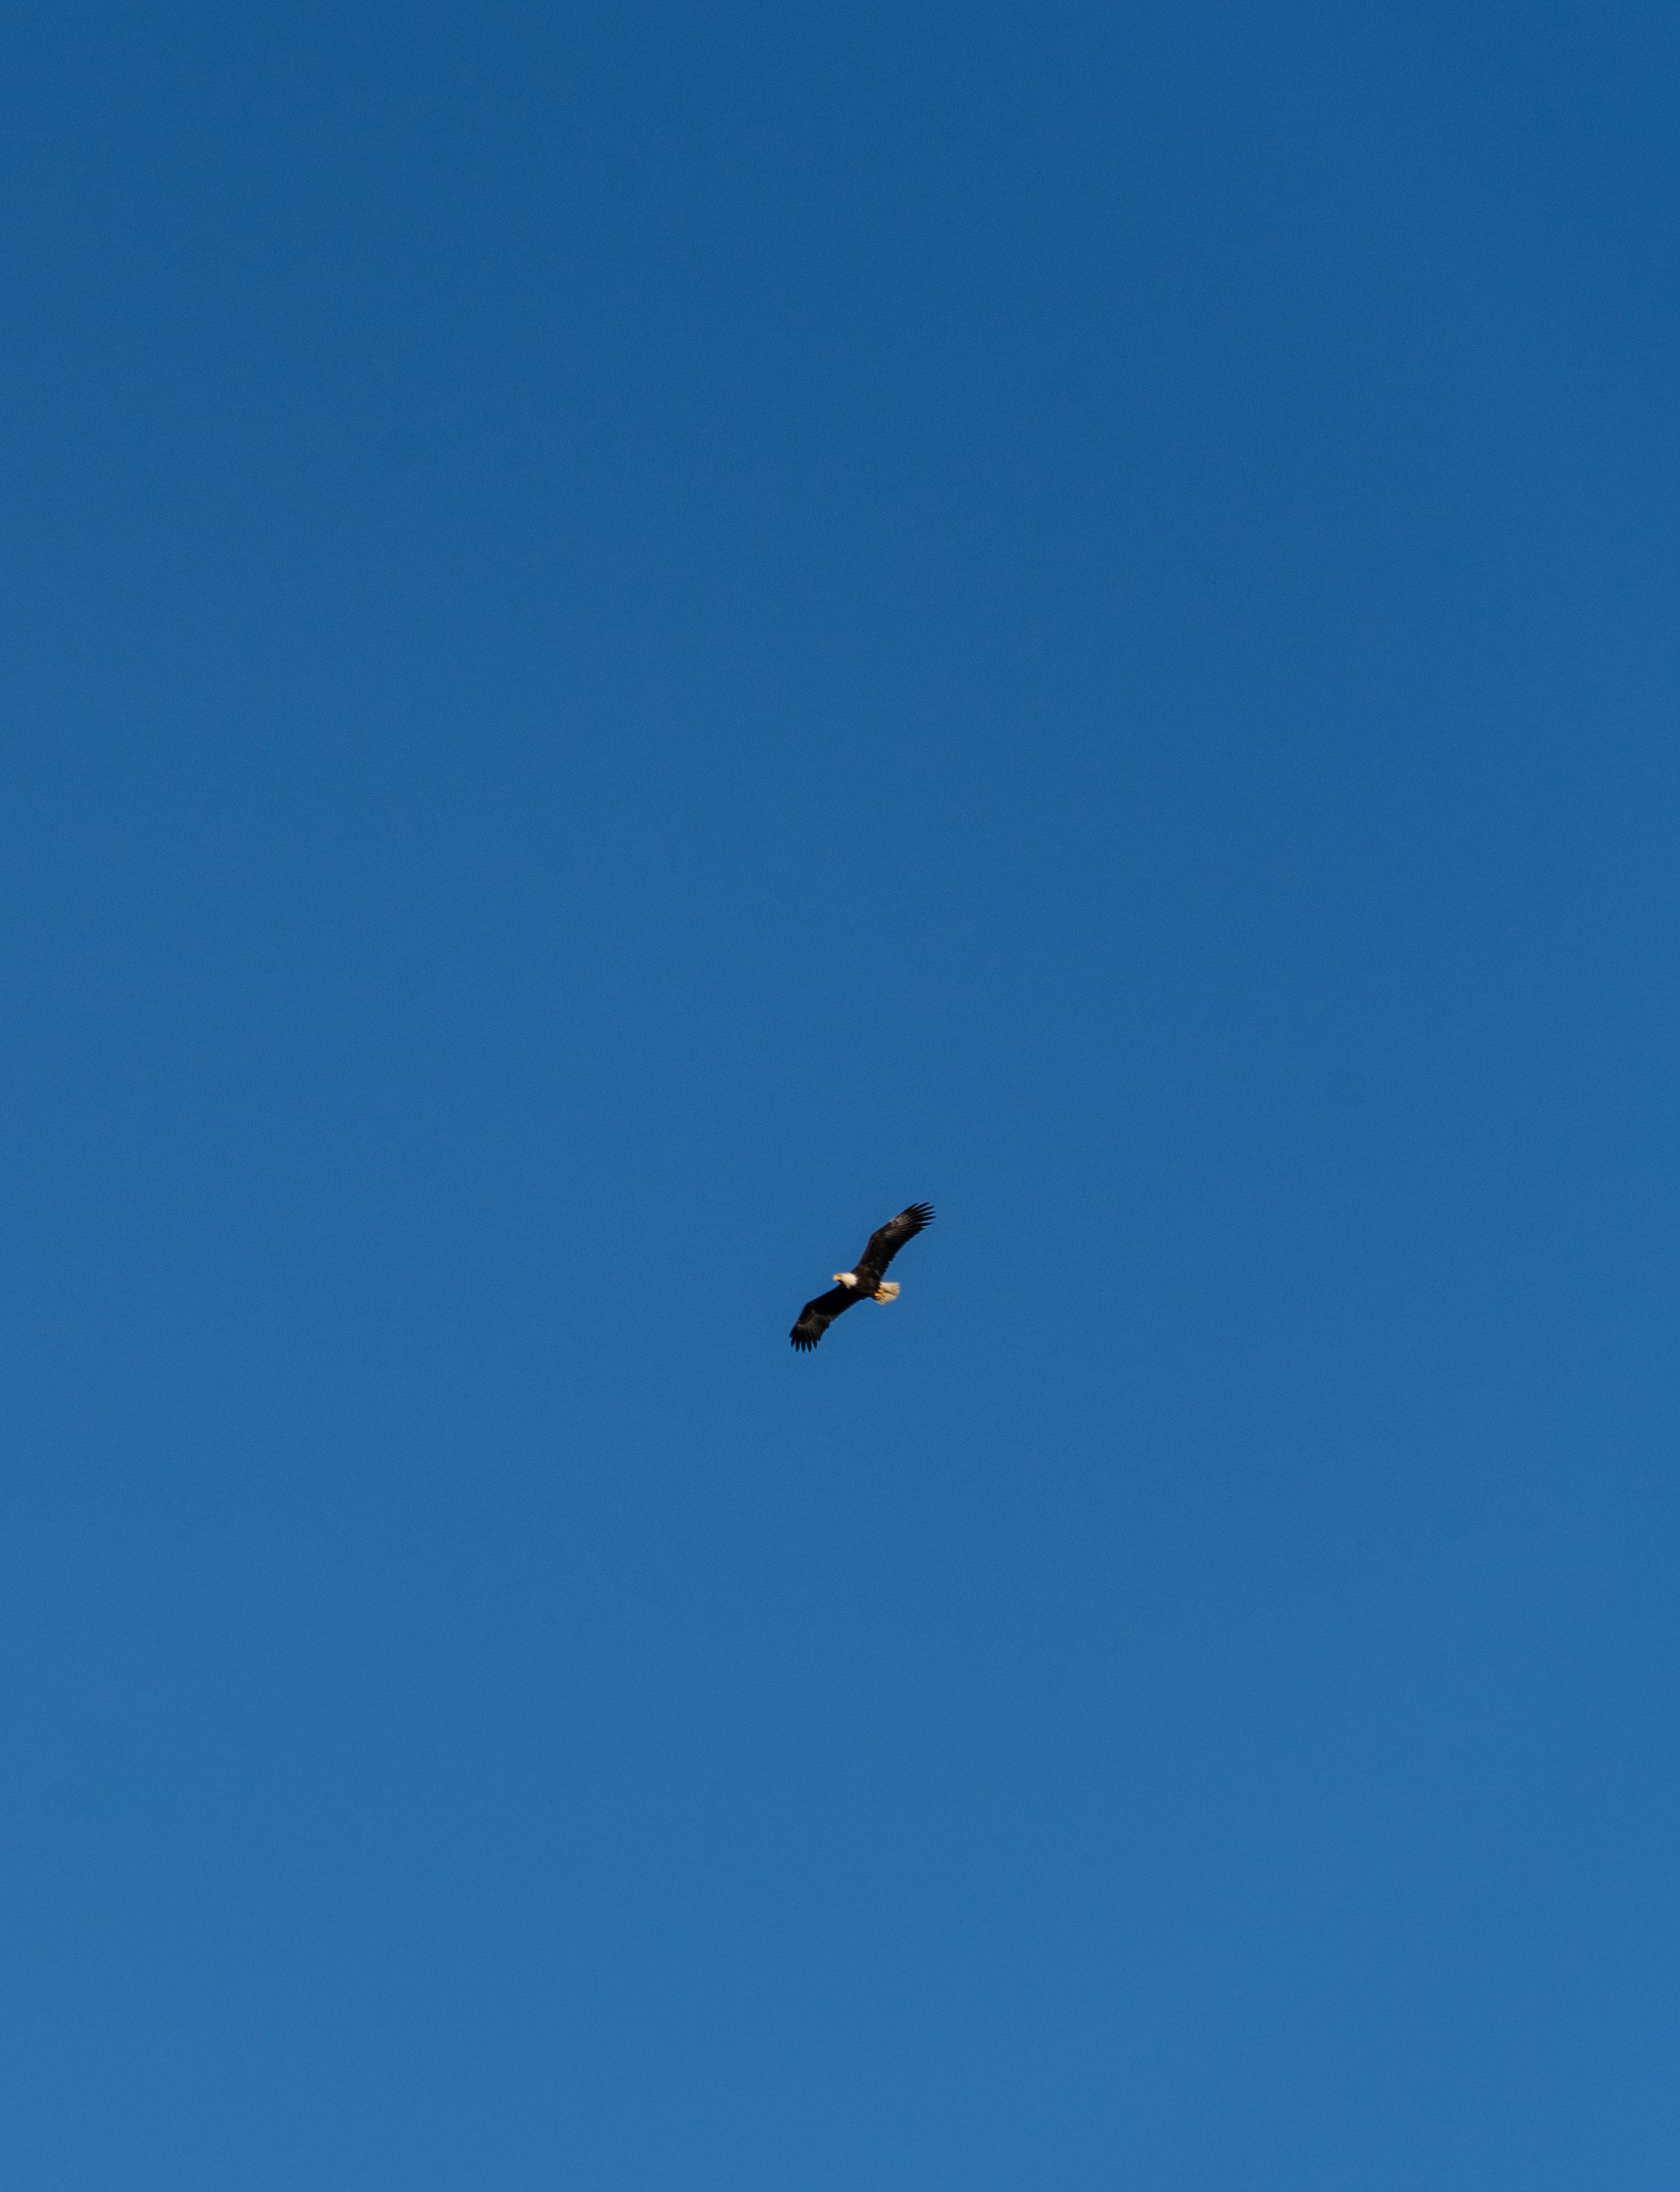 Saw so many bald eagles